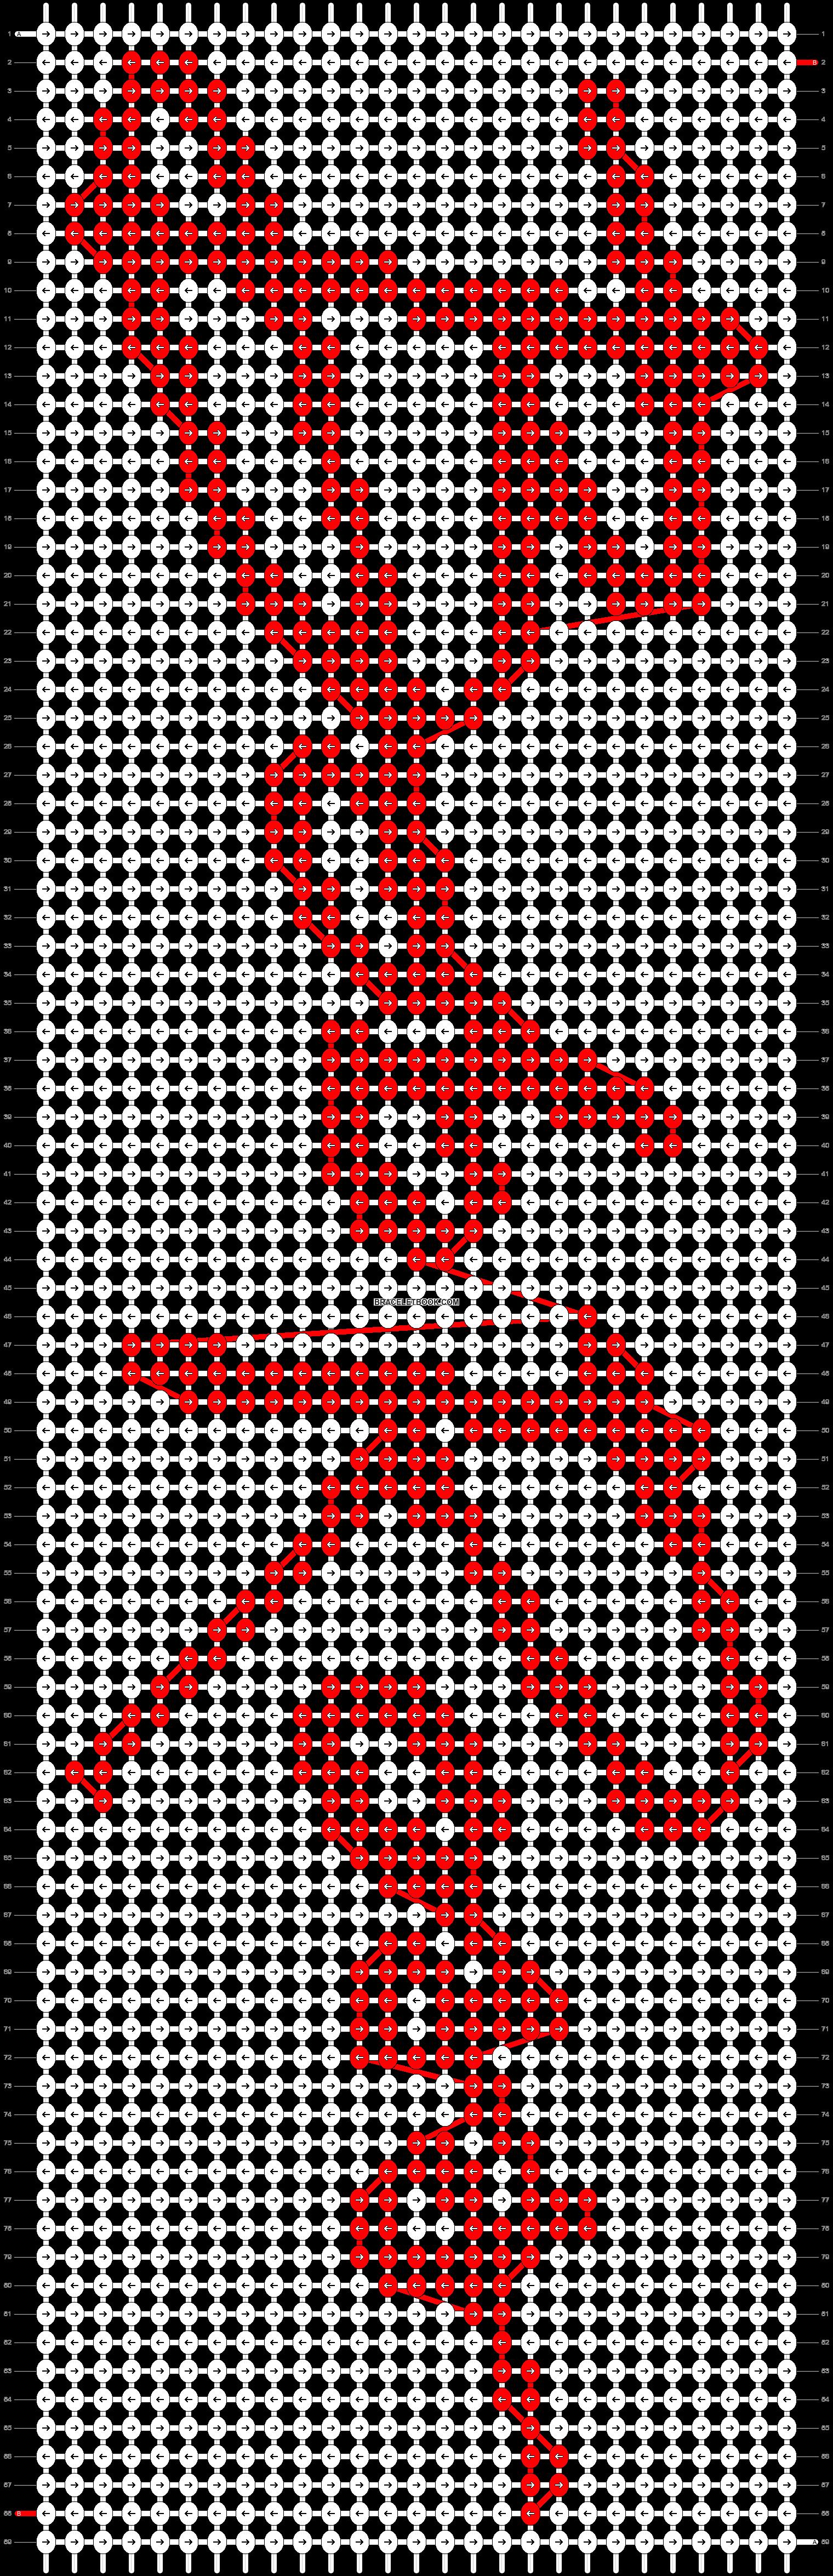 Alpha Pattern 44653 Braceletbook In 2020 Alpha Patterns Friendship Bracelet Patterns Art Painting Oil